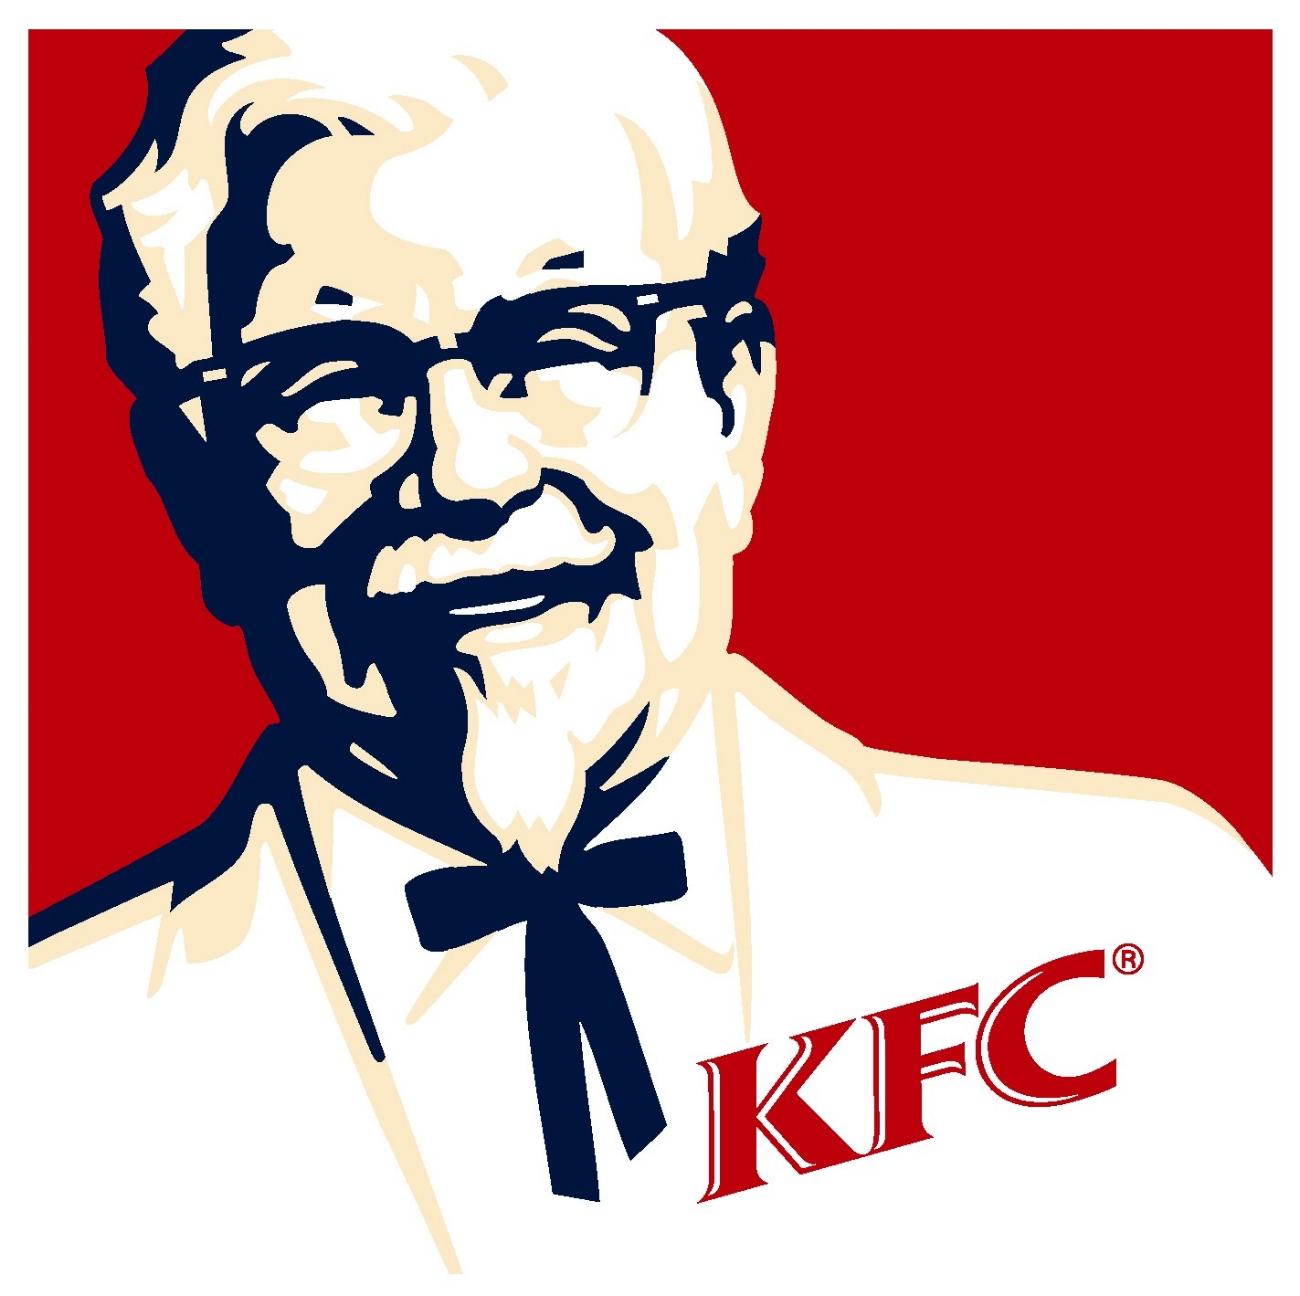 KFC2.jpg